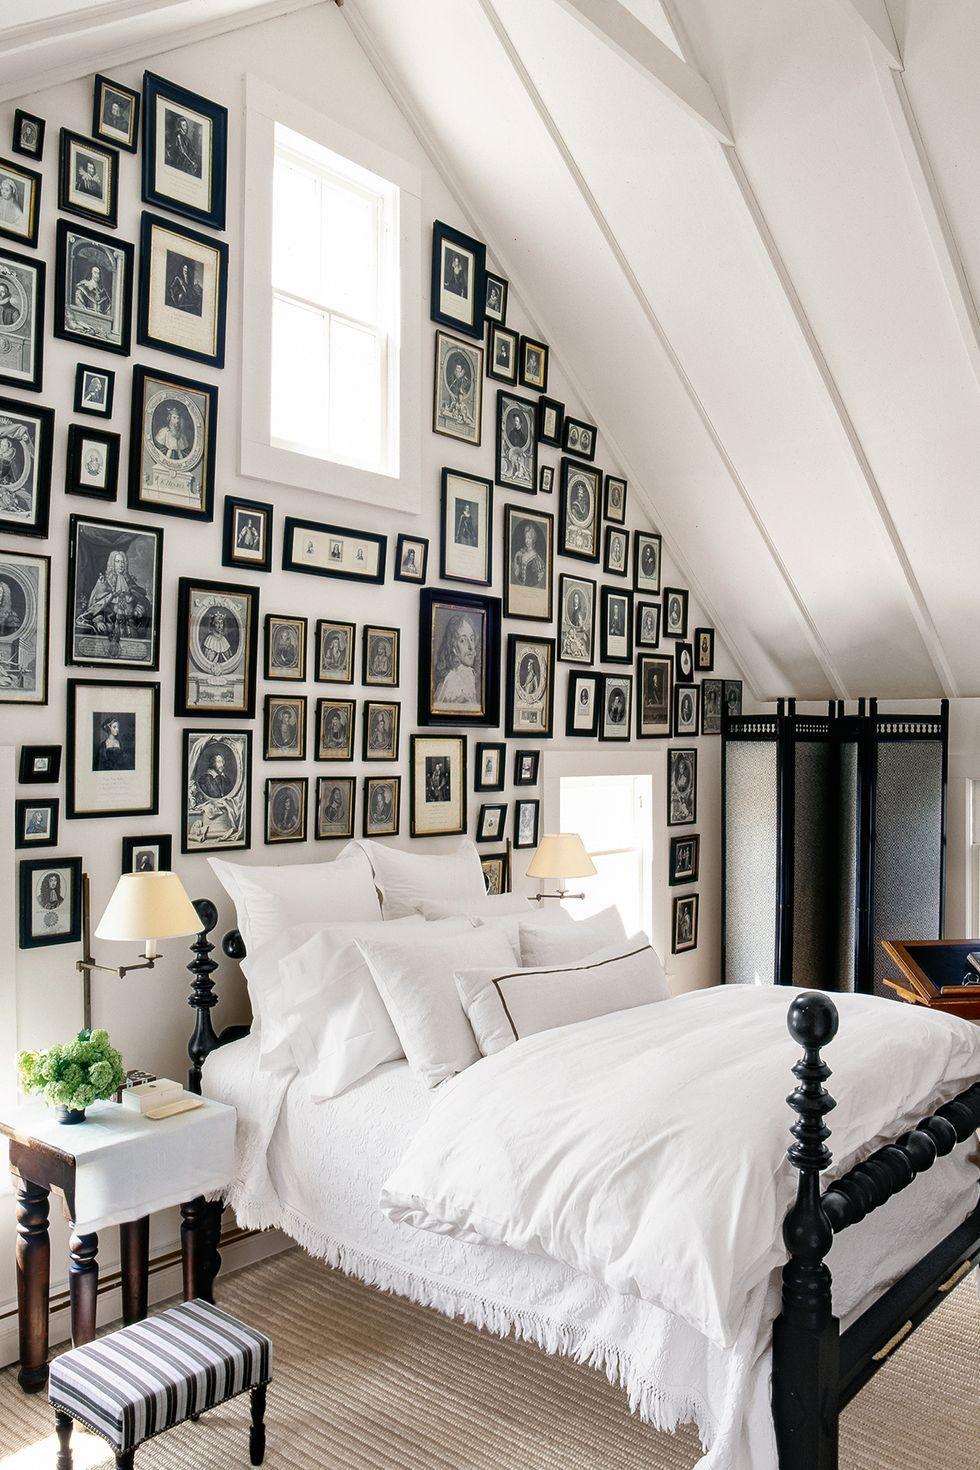 55 Easy Bedroom Makeover Ideas Diy Master Bedroom Decor On A Budget